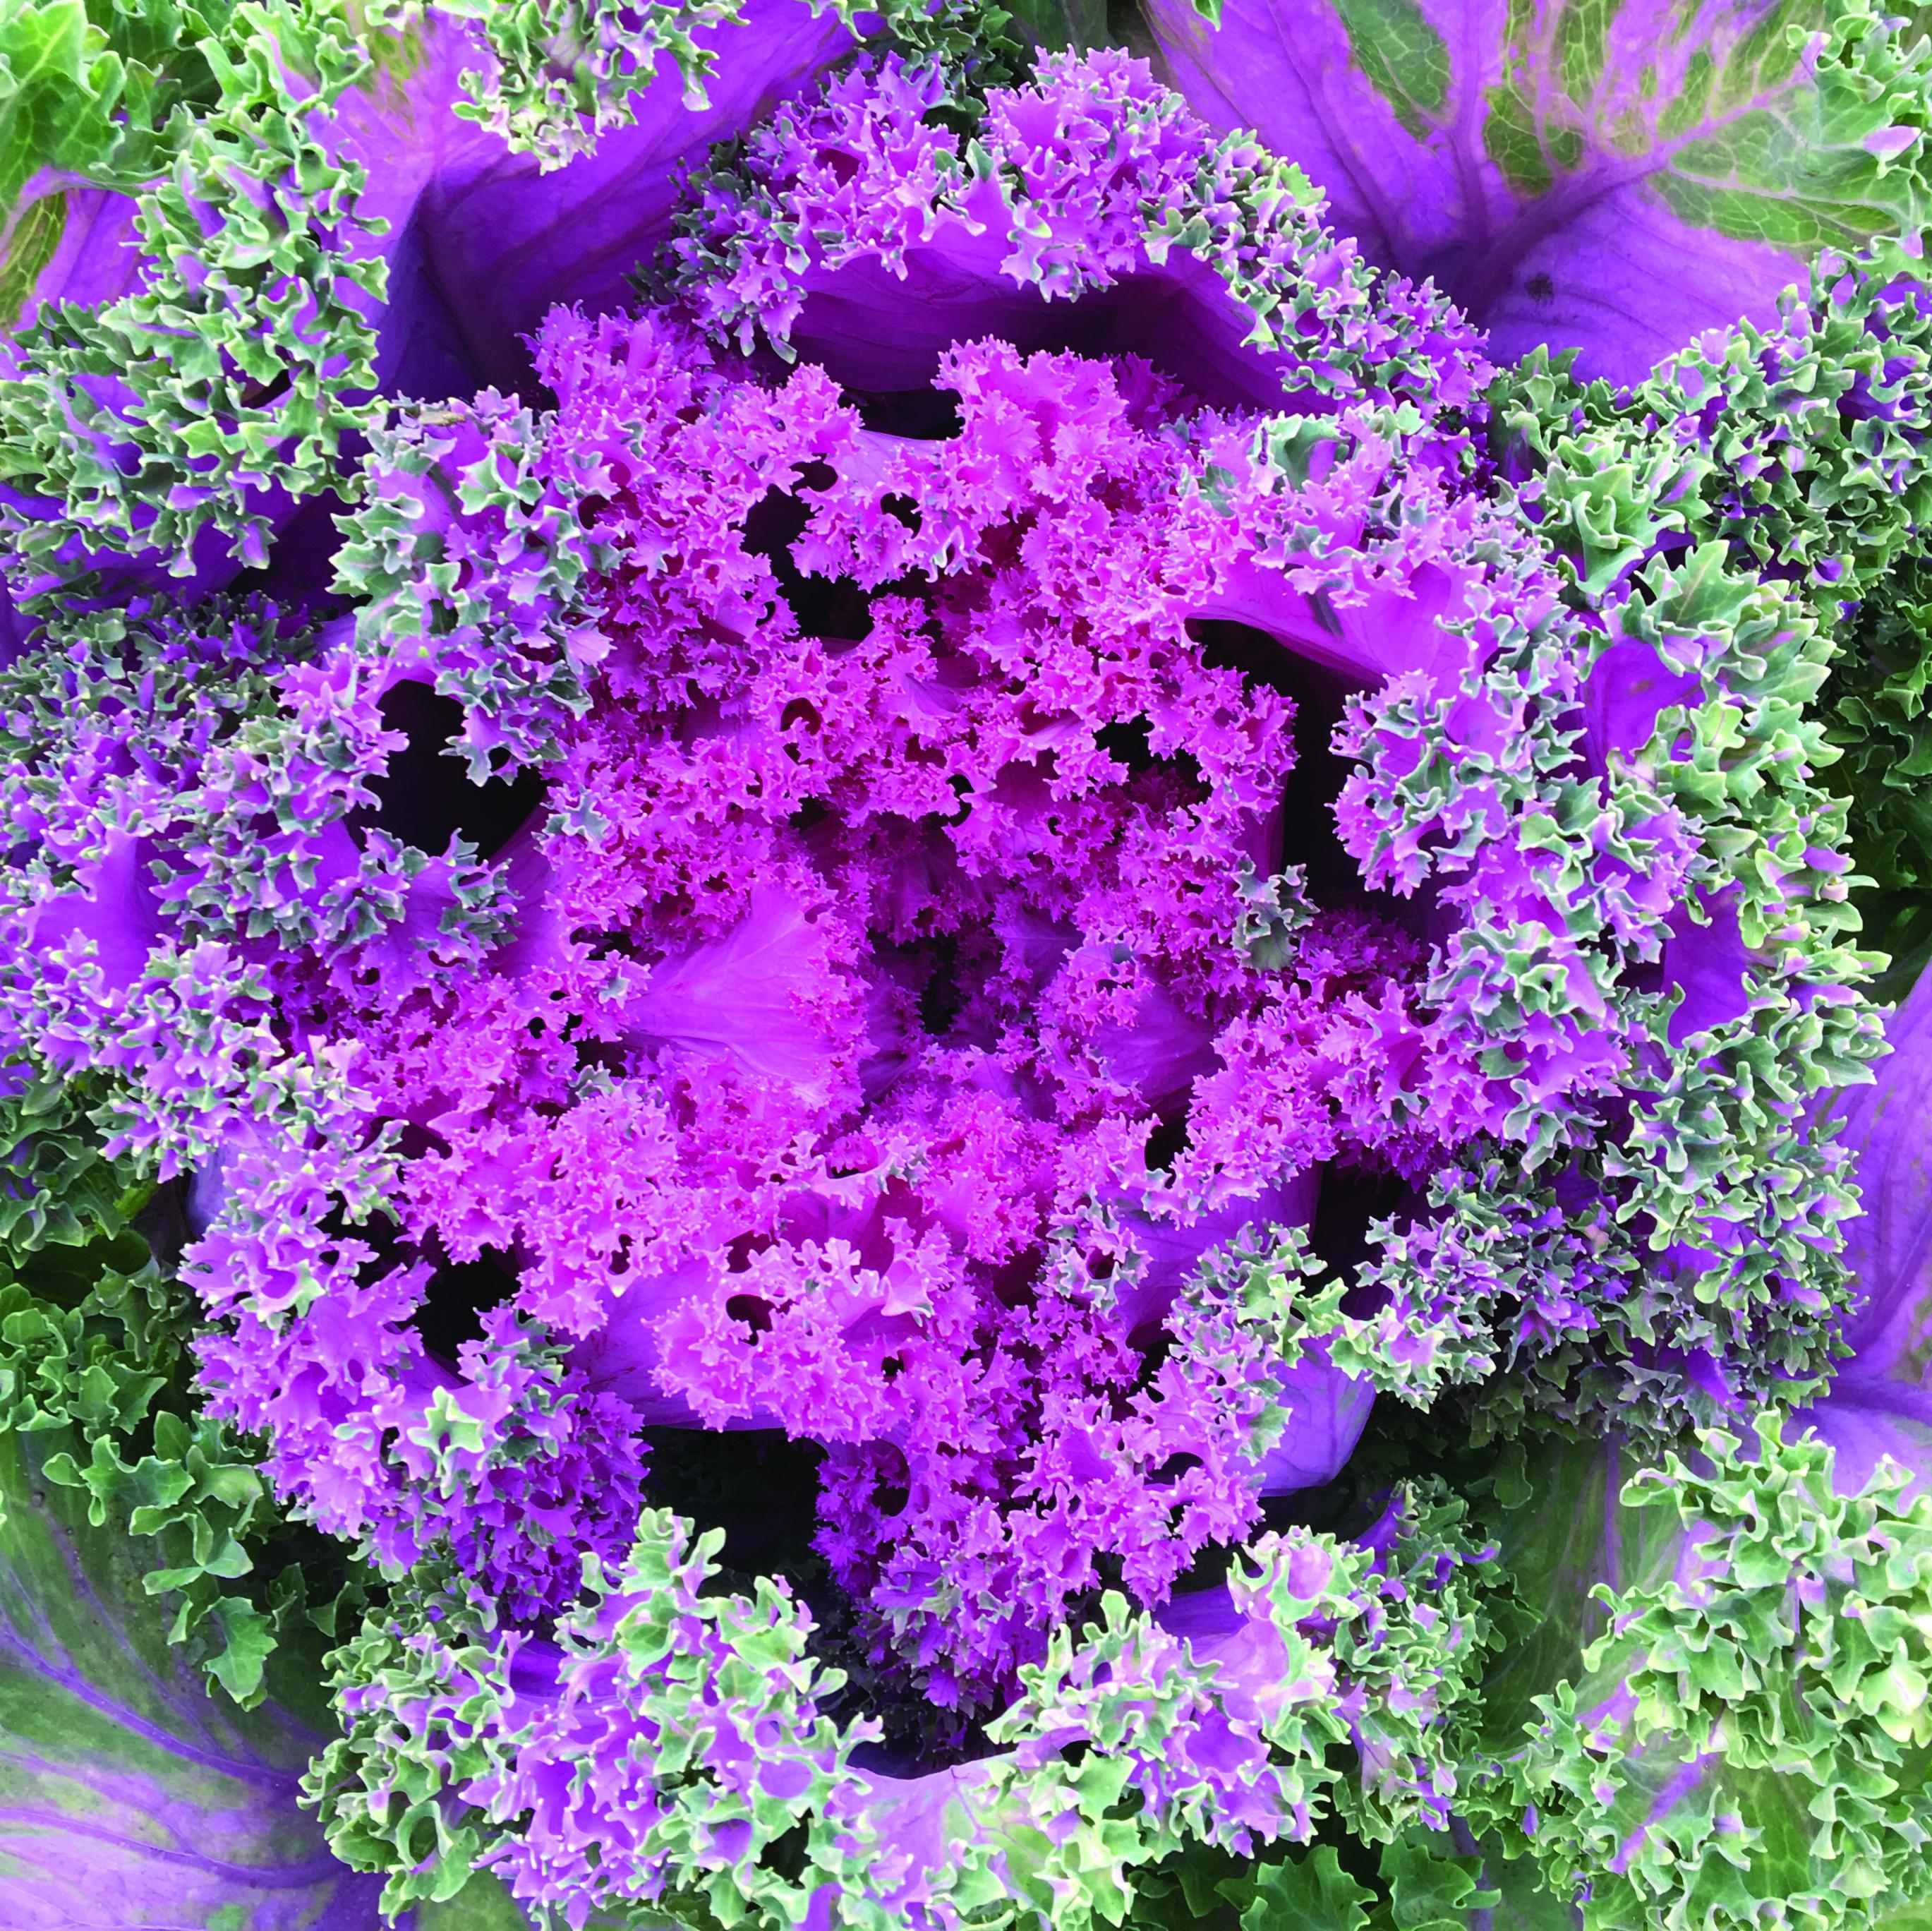 Kale, Garden Crimson